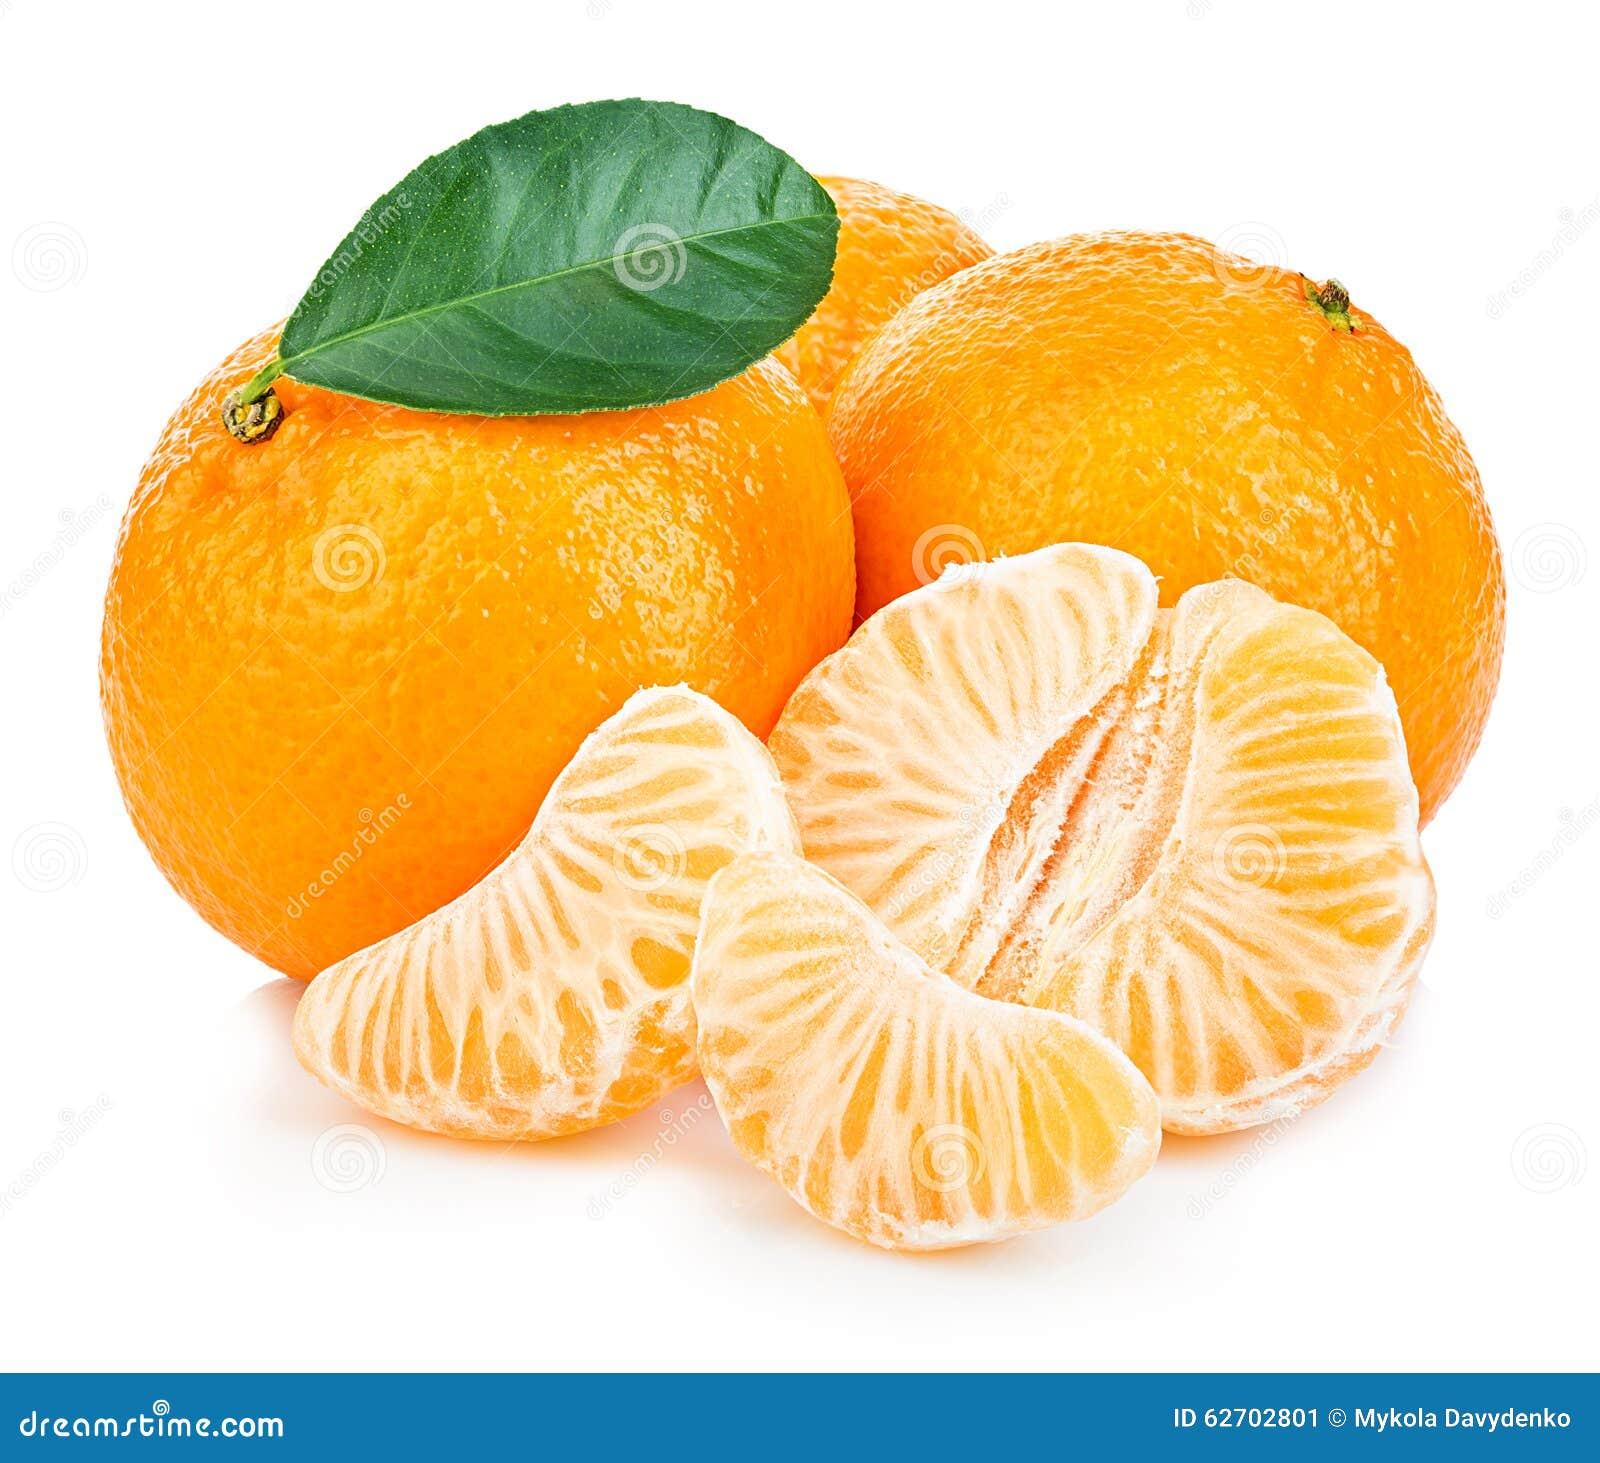 Download Ώριμο μανταρίνι με την κινηματογράφηση σε πρώτο πλάνο φύλλων σε ένα άσπρο υπόβαθρο Tangerine πορτοκάλι με το φύλλο σε ένα άσπρο υ Στοκ Εικόνα - εικόνα από φύση, κλημεντίνη: 62702801